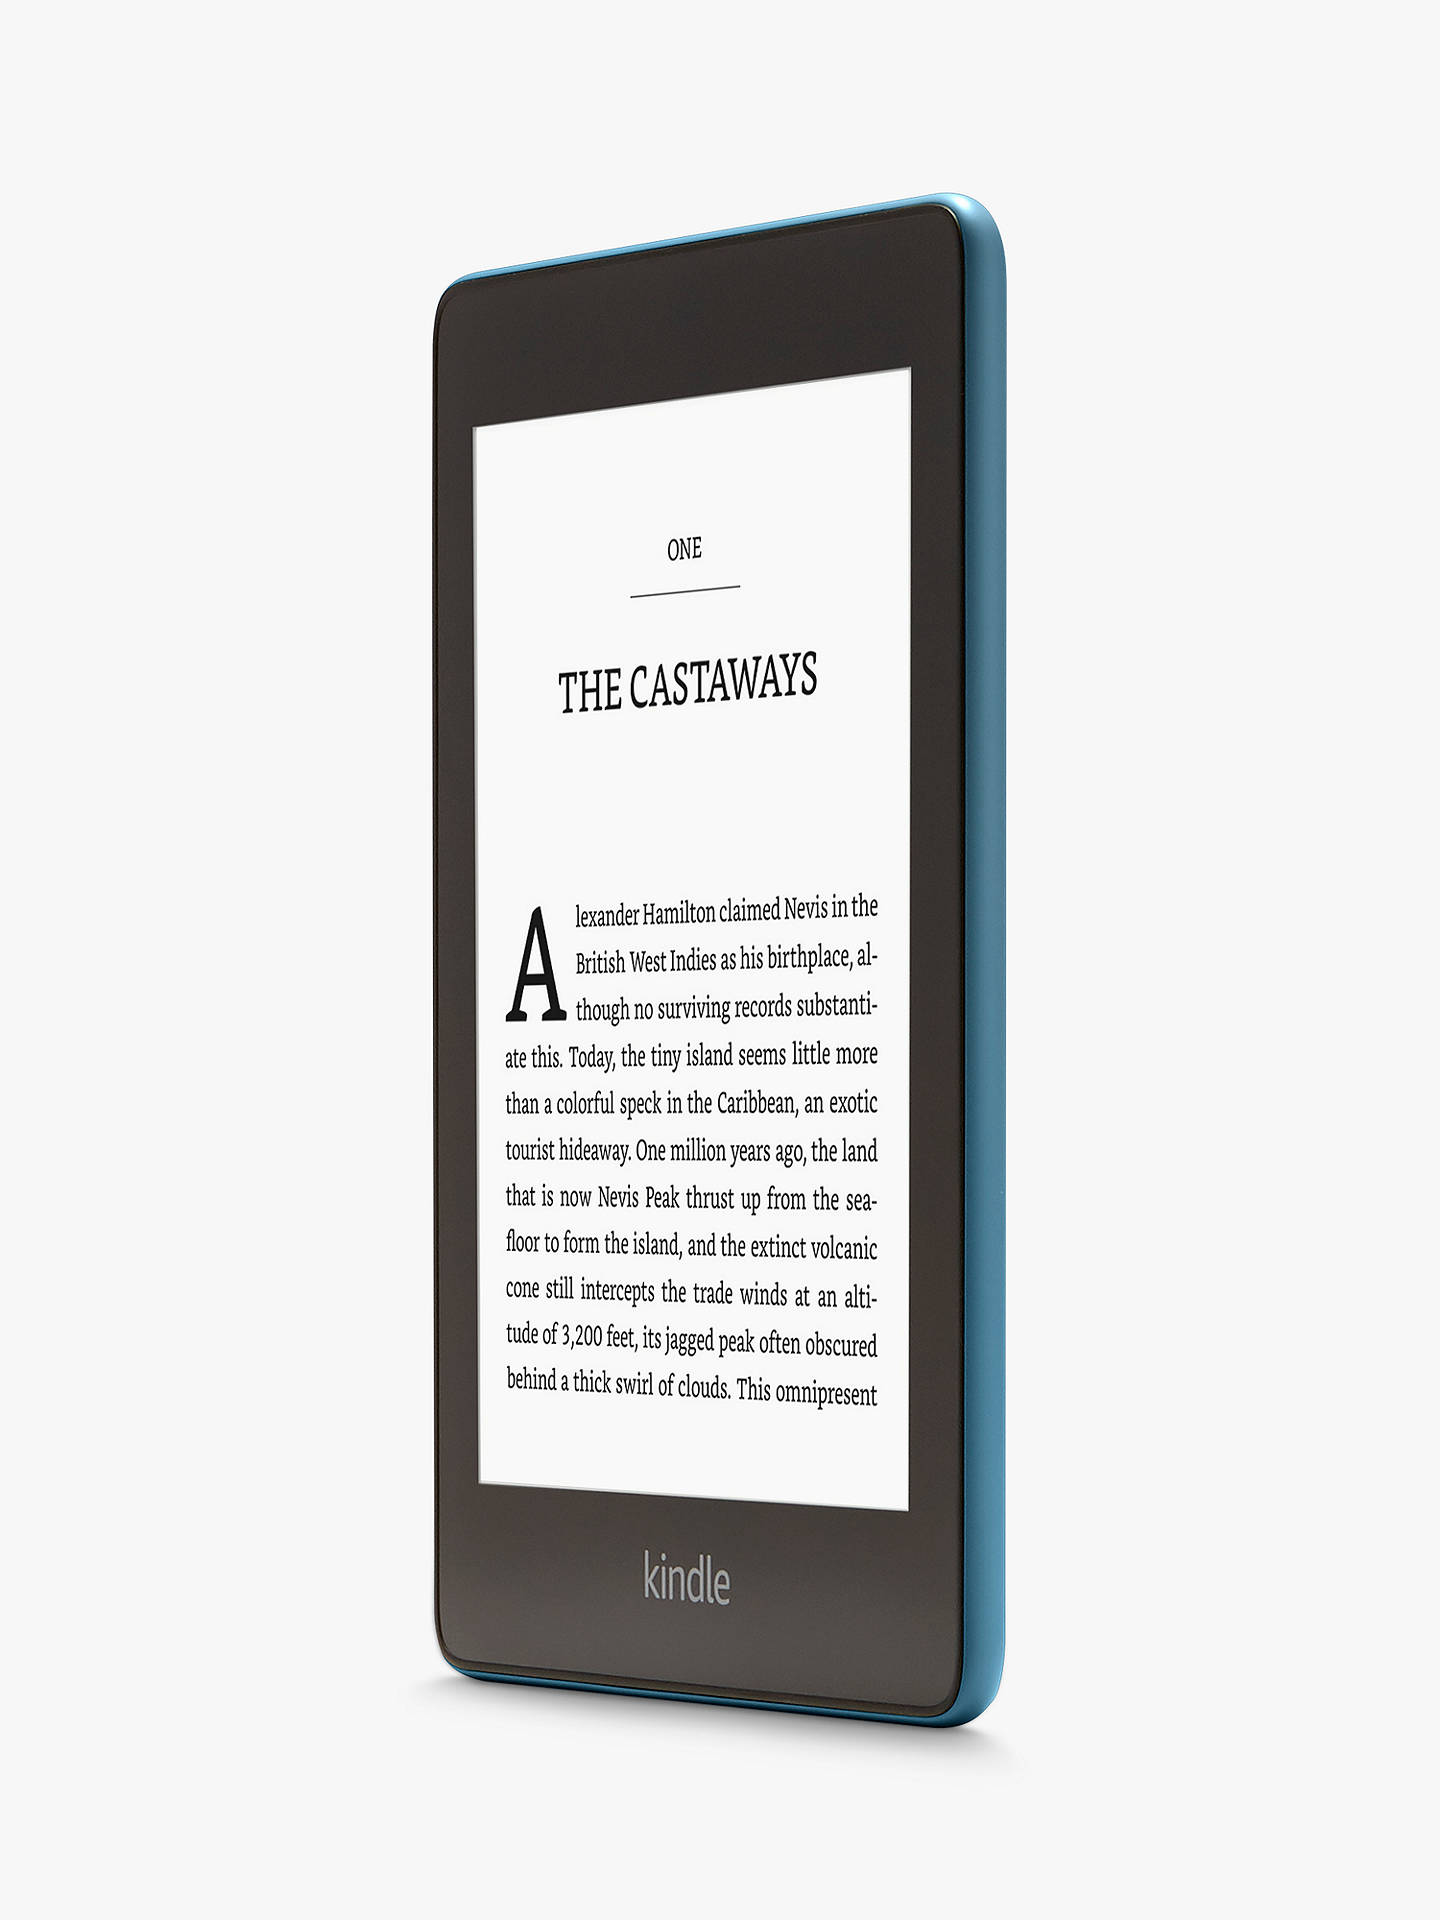 "Amazon Kindle Paperwhite, Waterproof eReader, 6"" High ..."